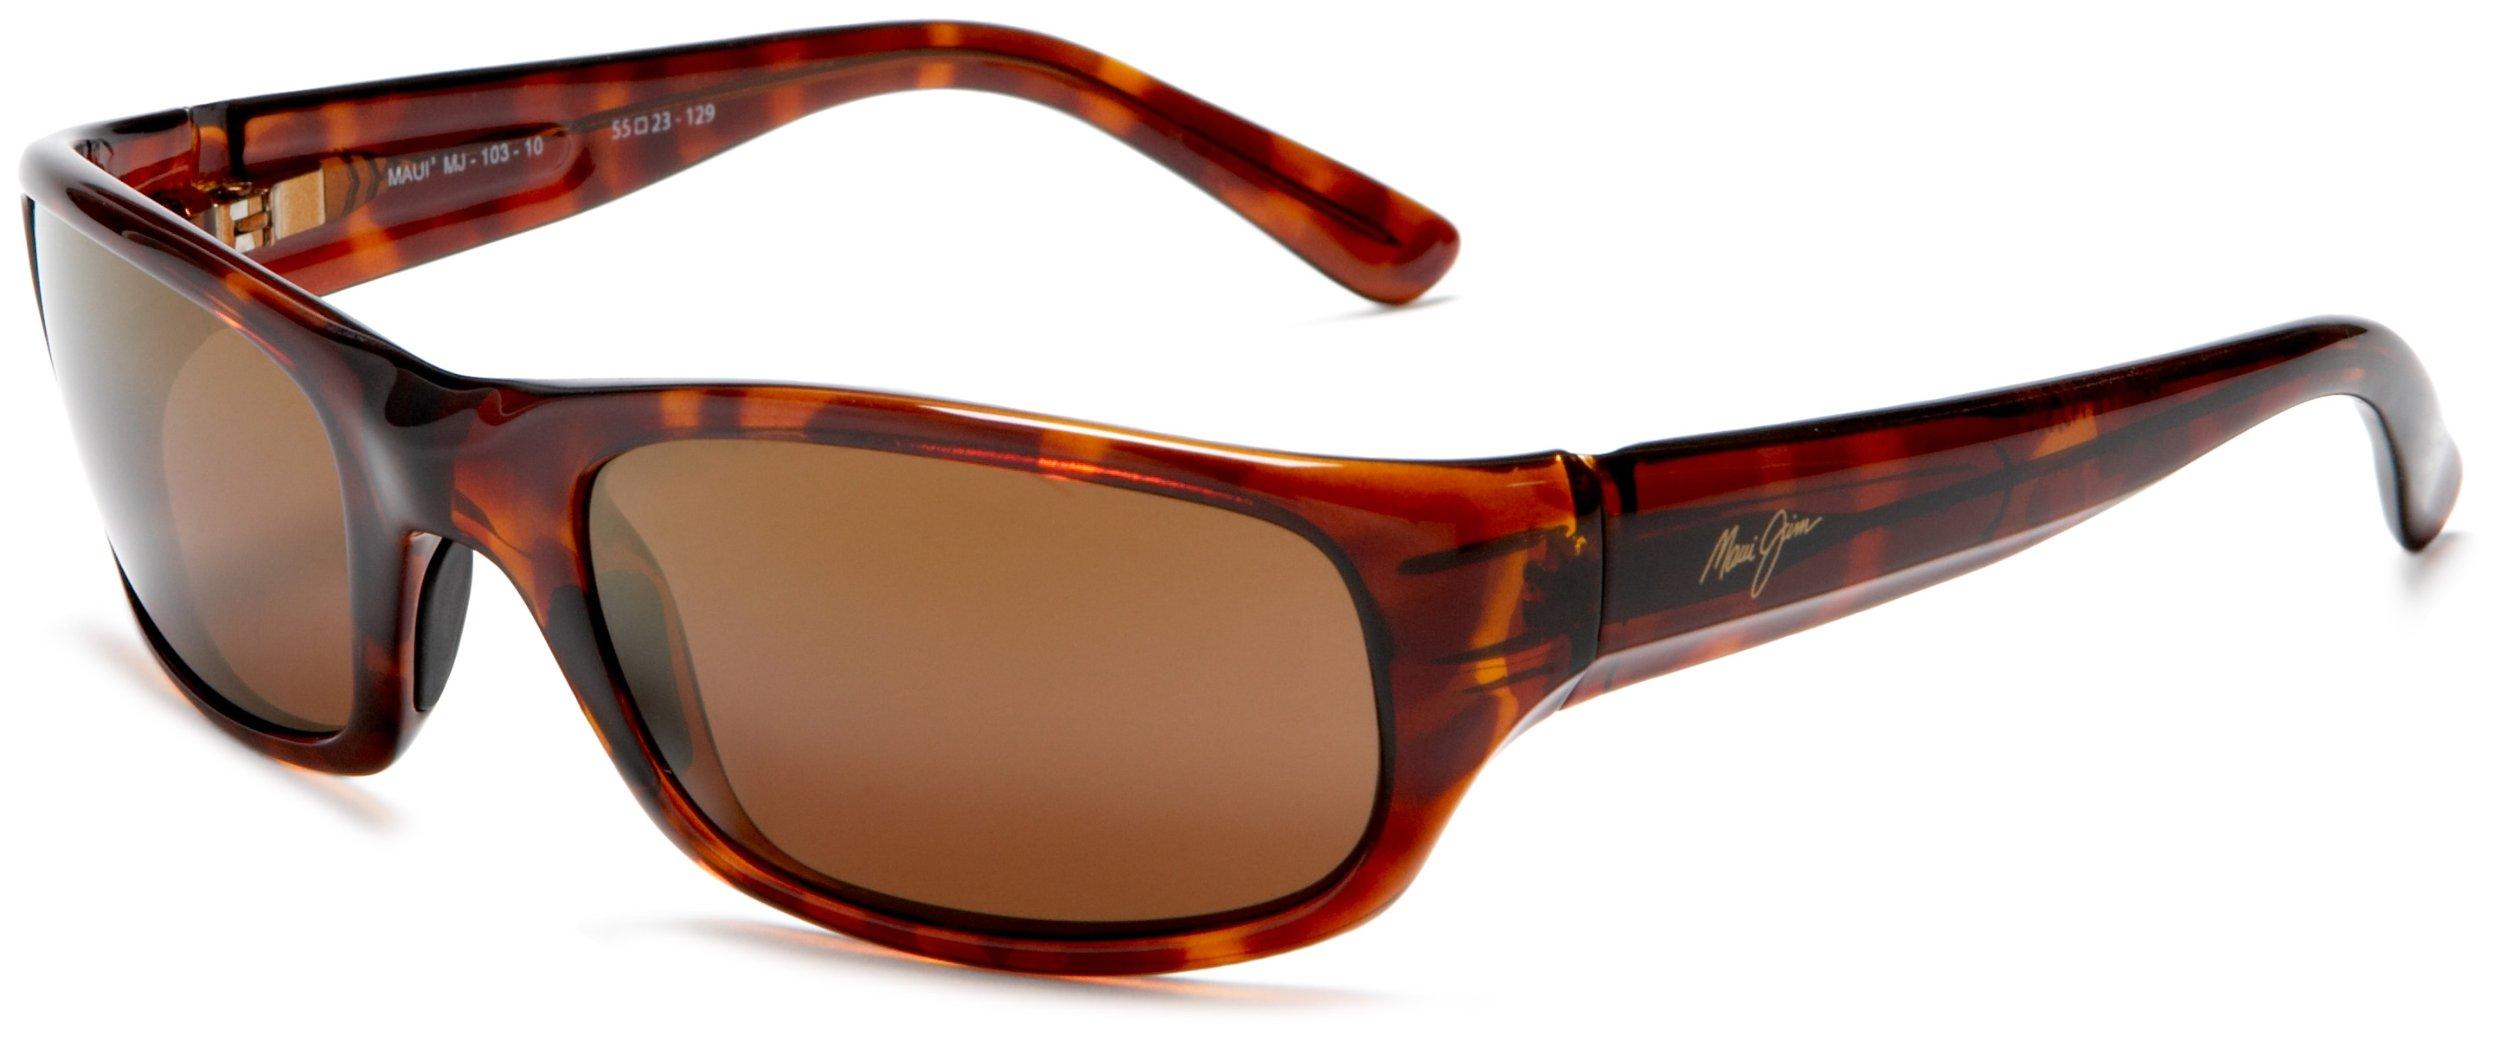 Maui Jim Stingray Polarized Sunglasses Gloss Tortoise / HCL Bronze One Size